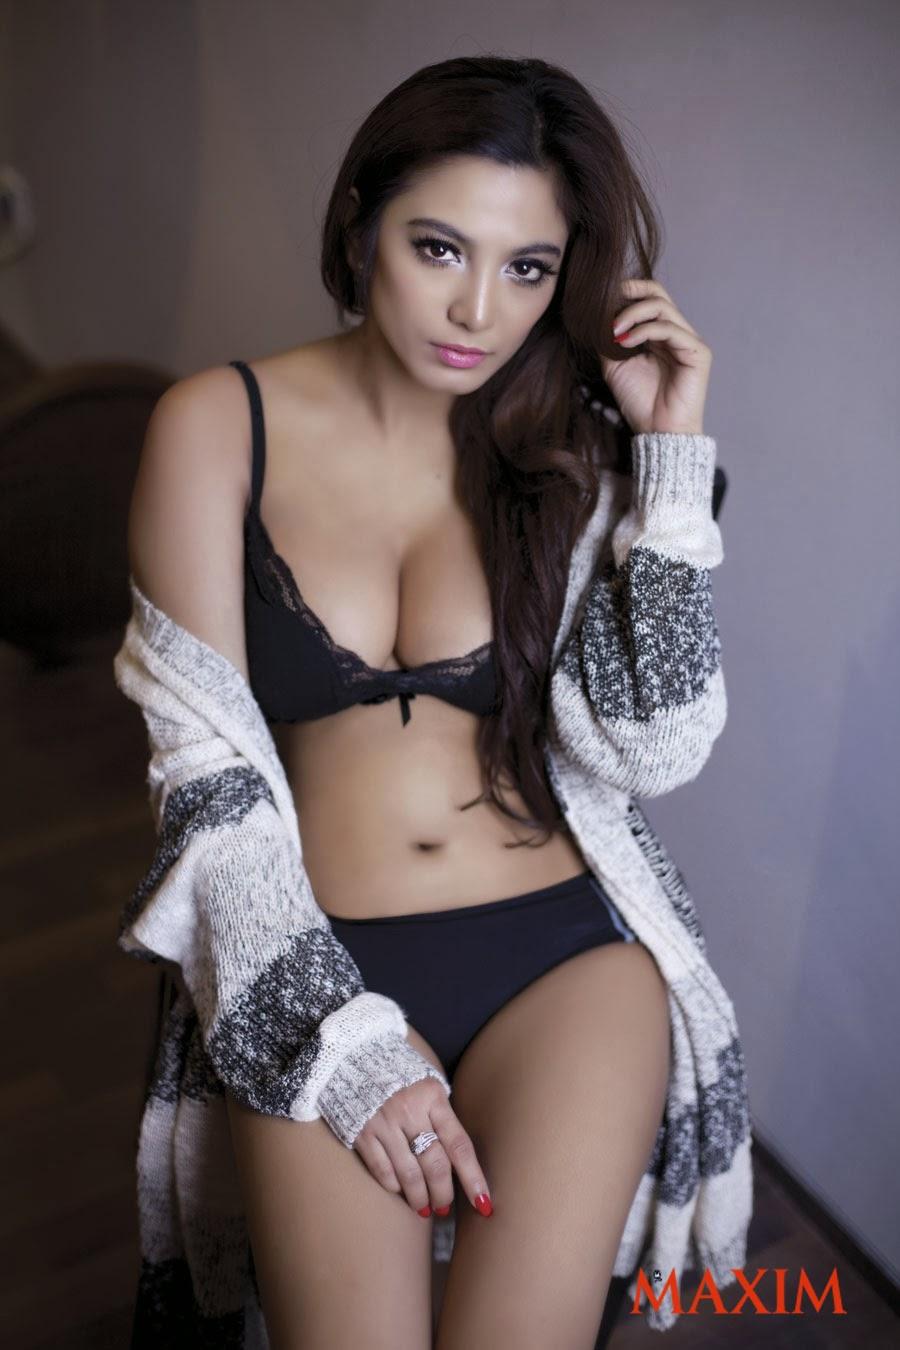 Foto Sisi Salsabila Model Maxim Indonesia Februari 2014